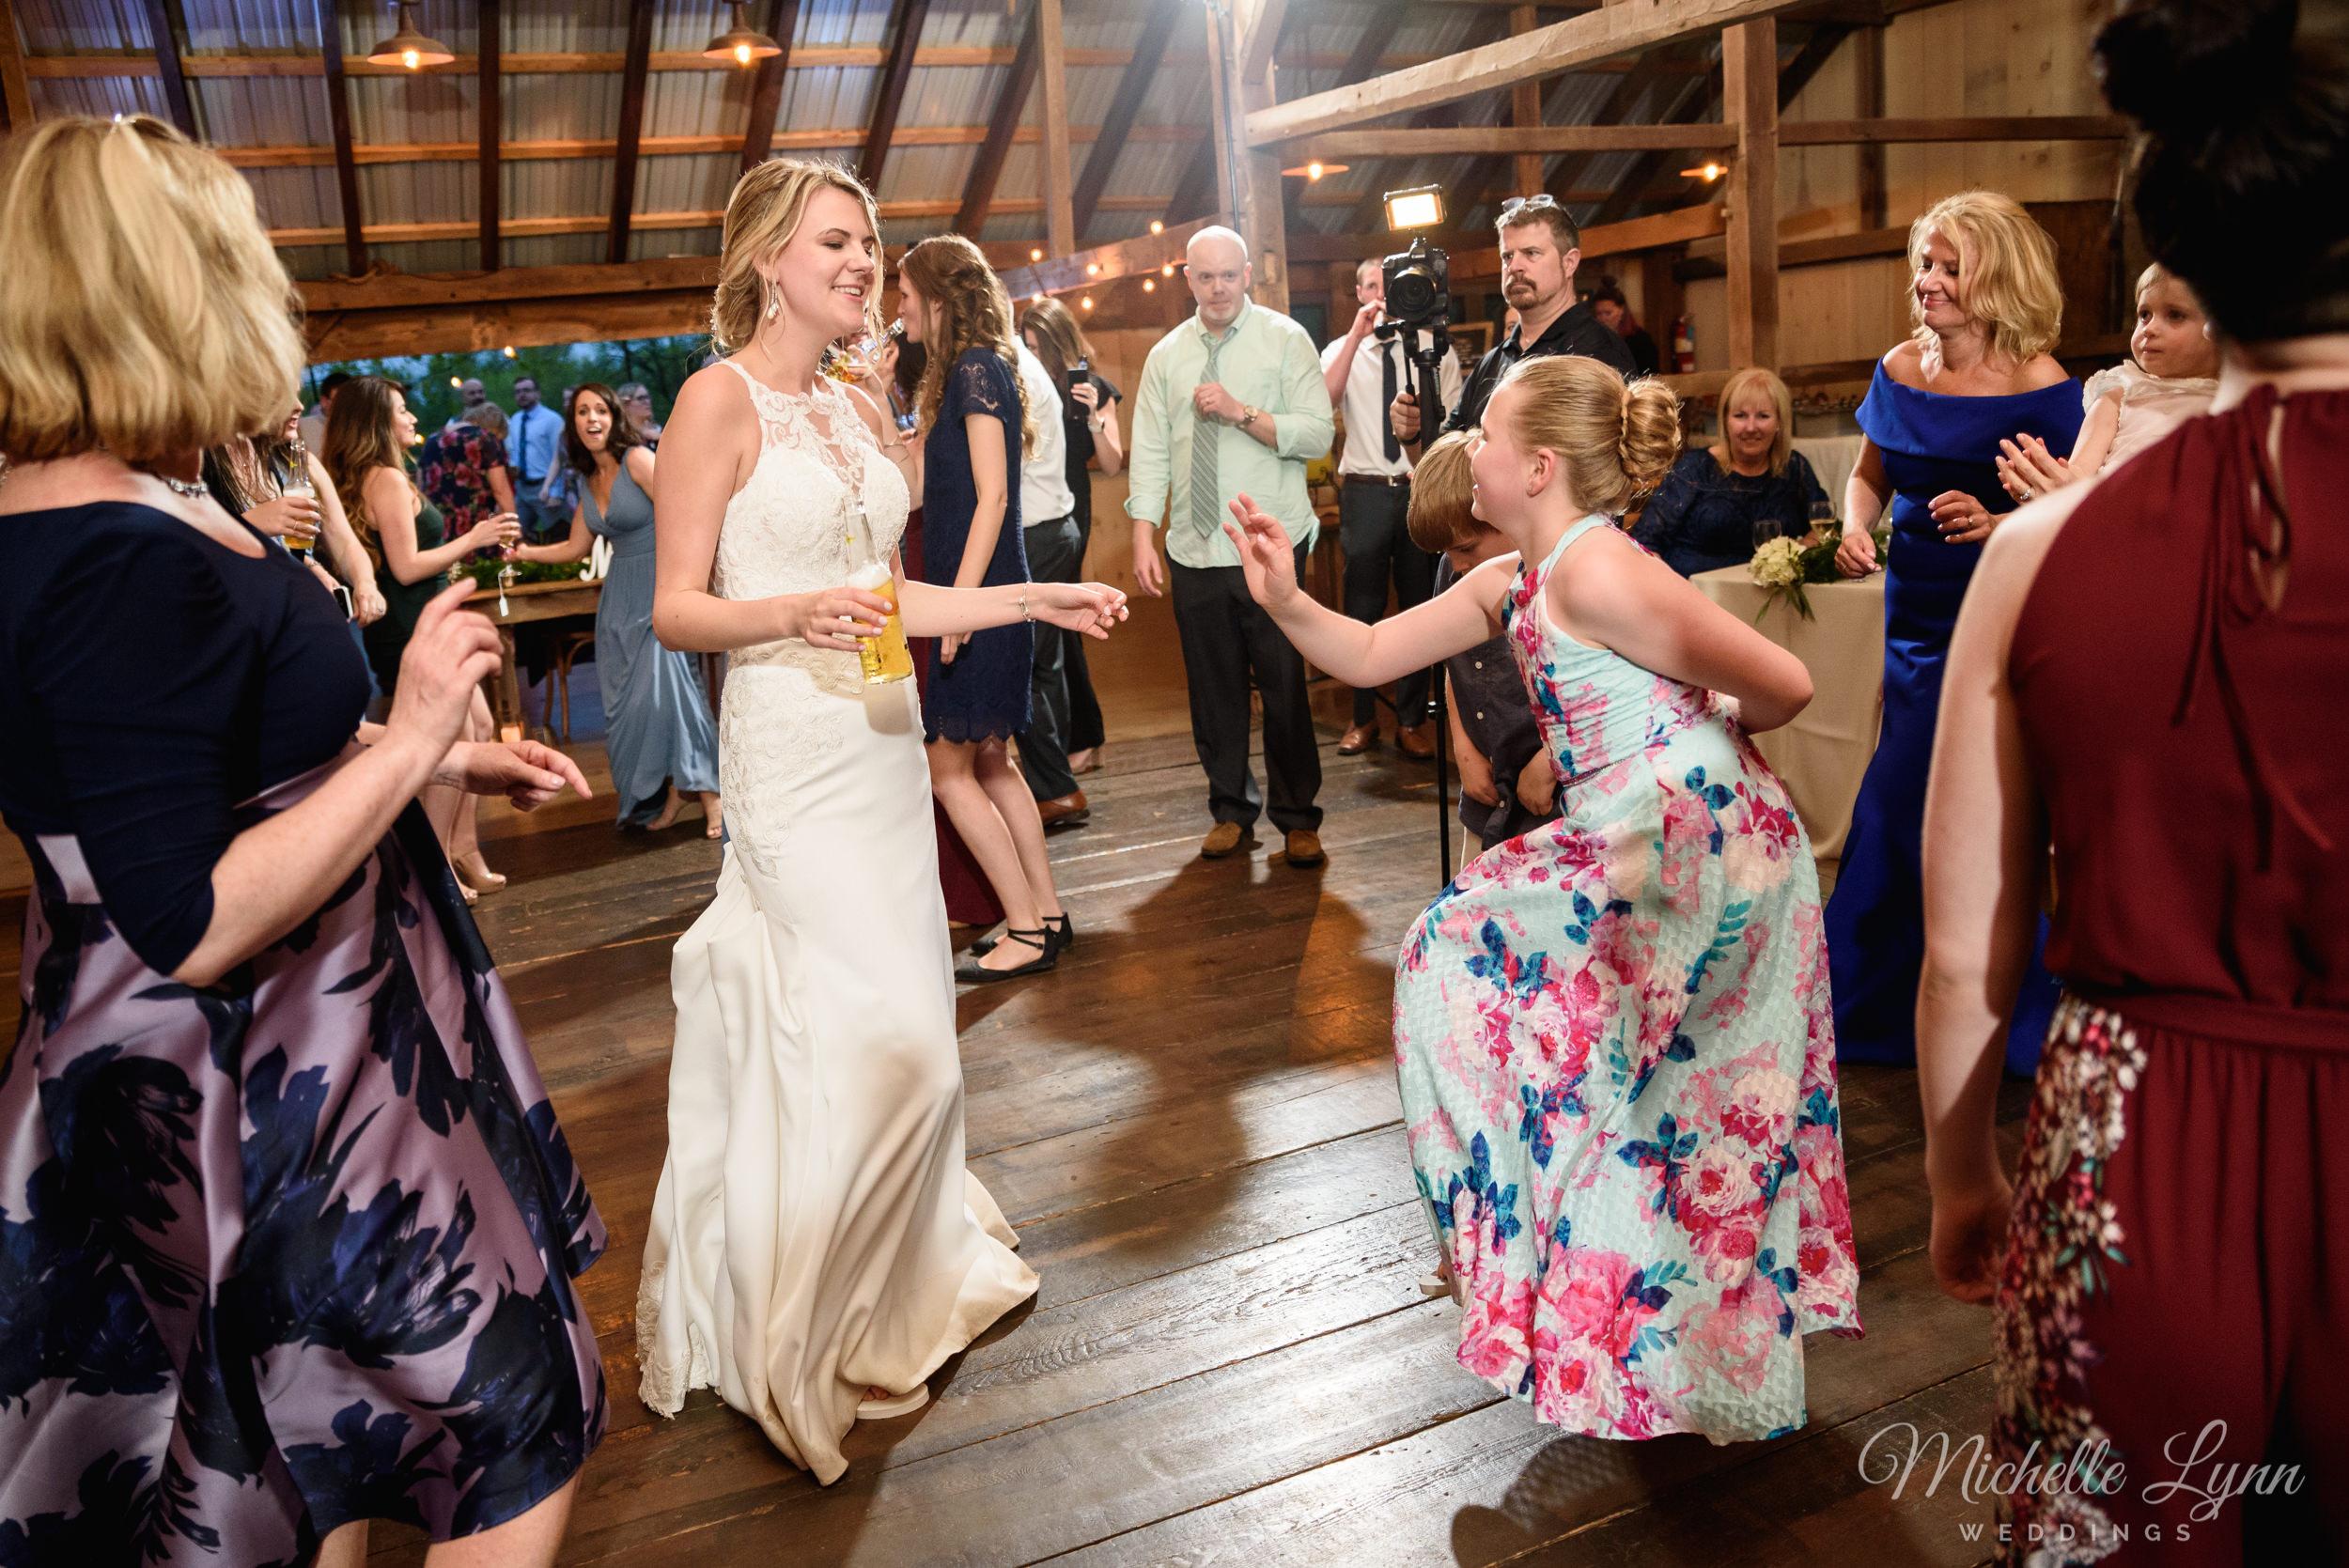 mlw-the-farm-bakery-and-events-wedding-photos-81.jpg